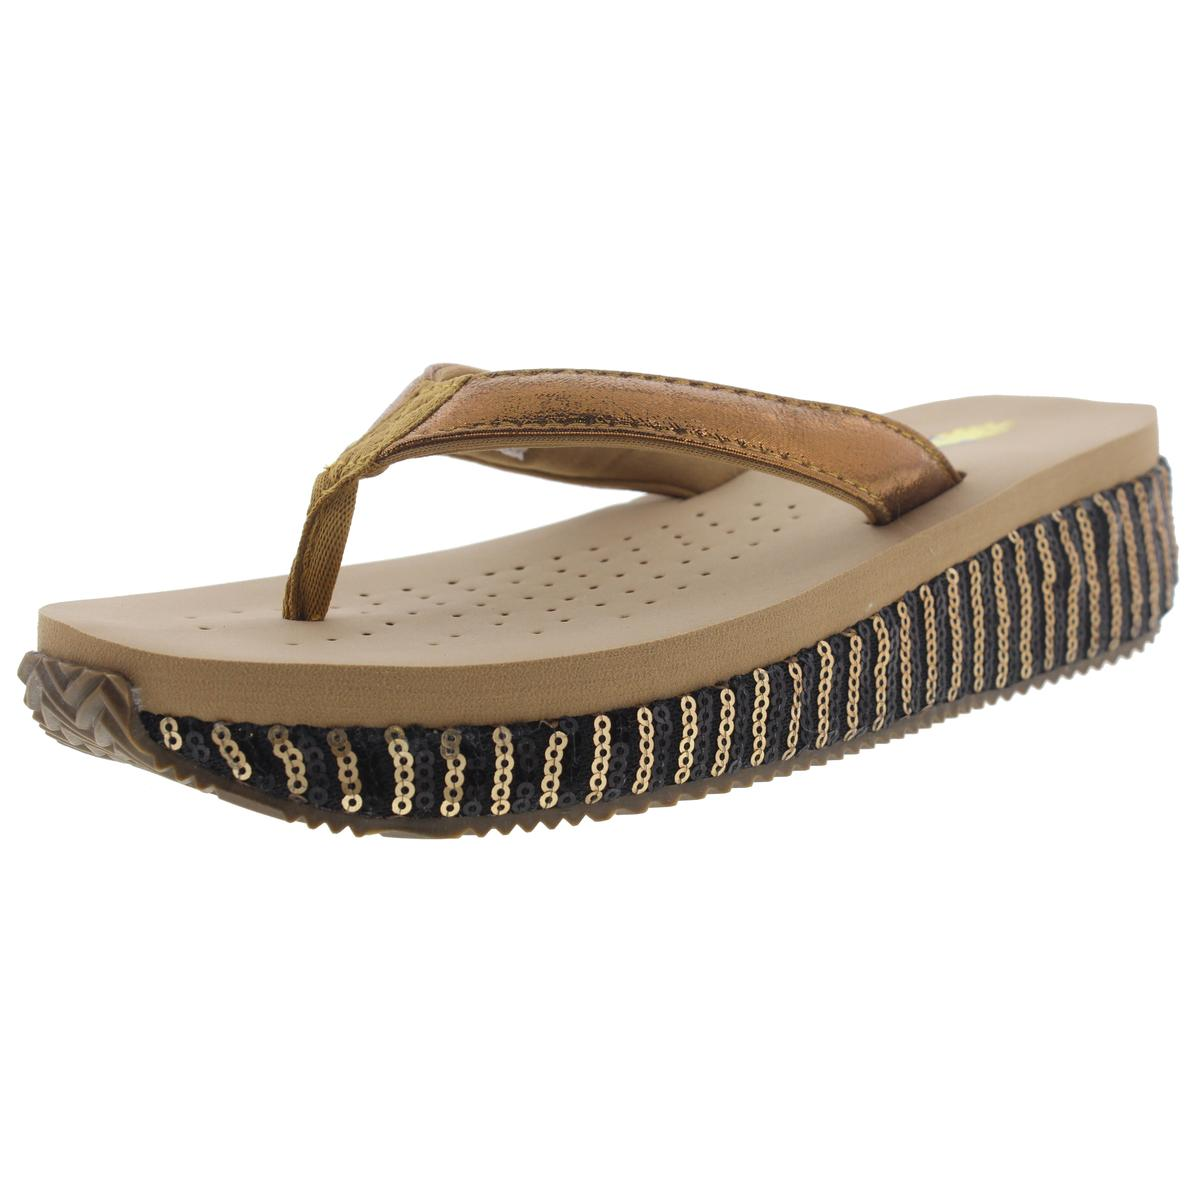 Womens sandals walmart - Womens Sandals Walmart 24